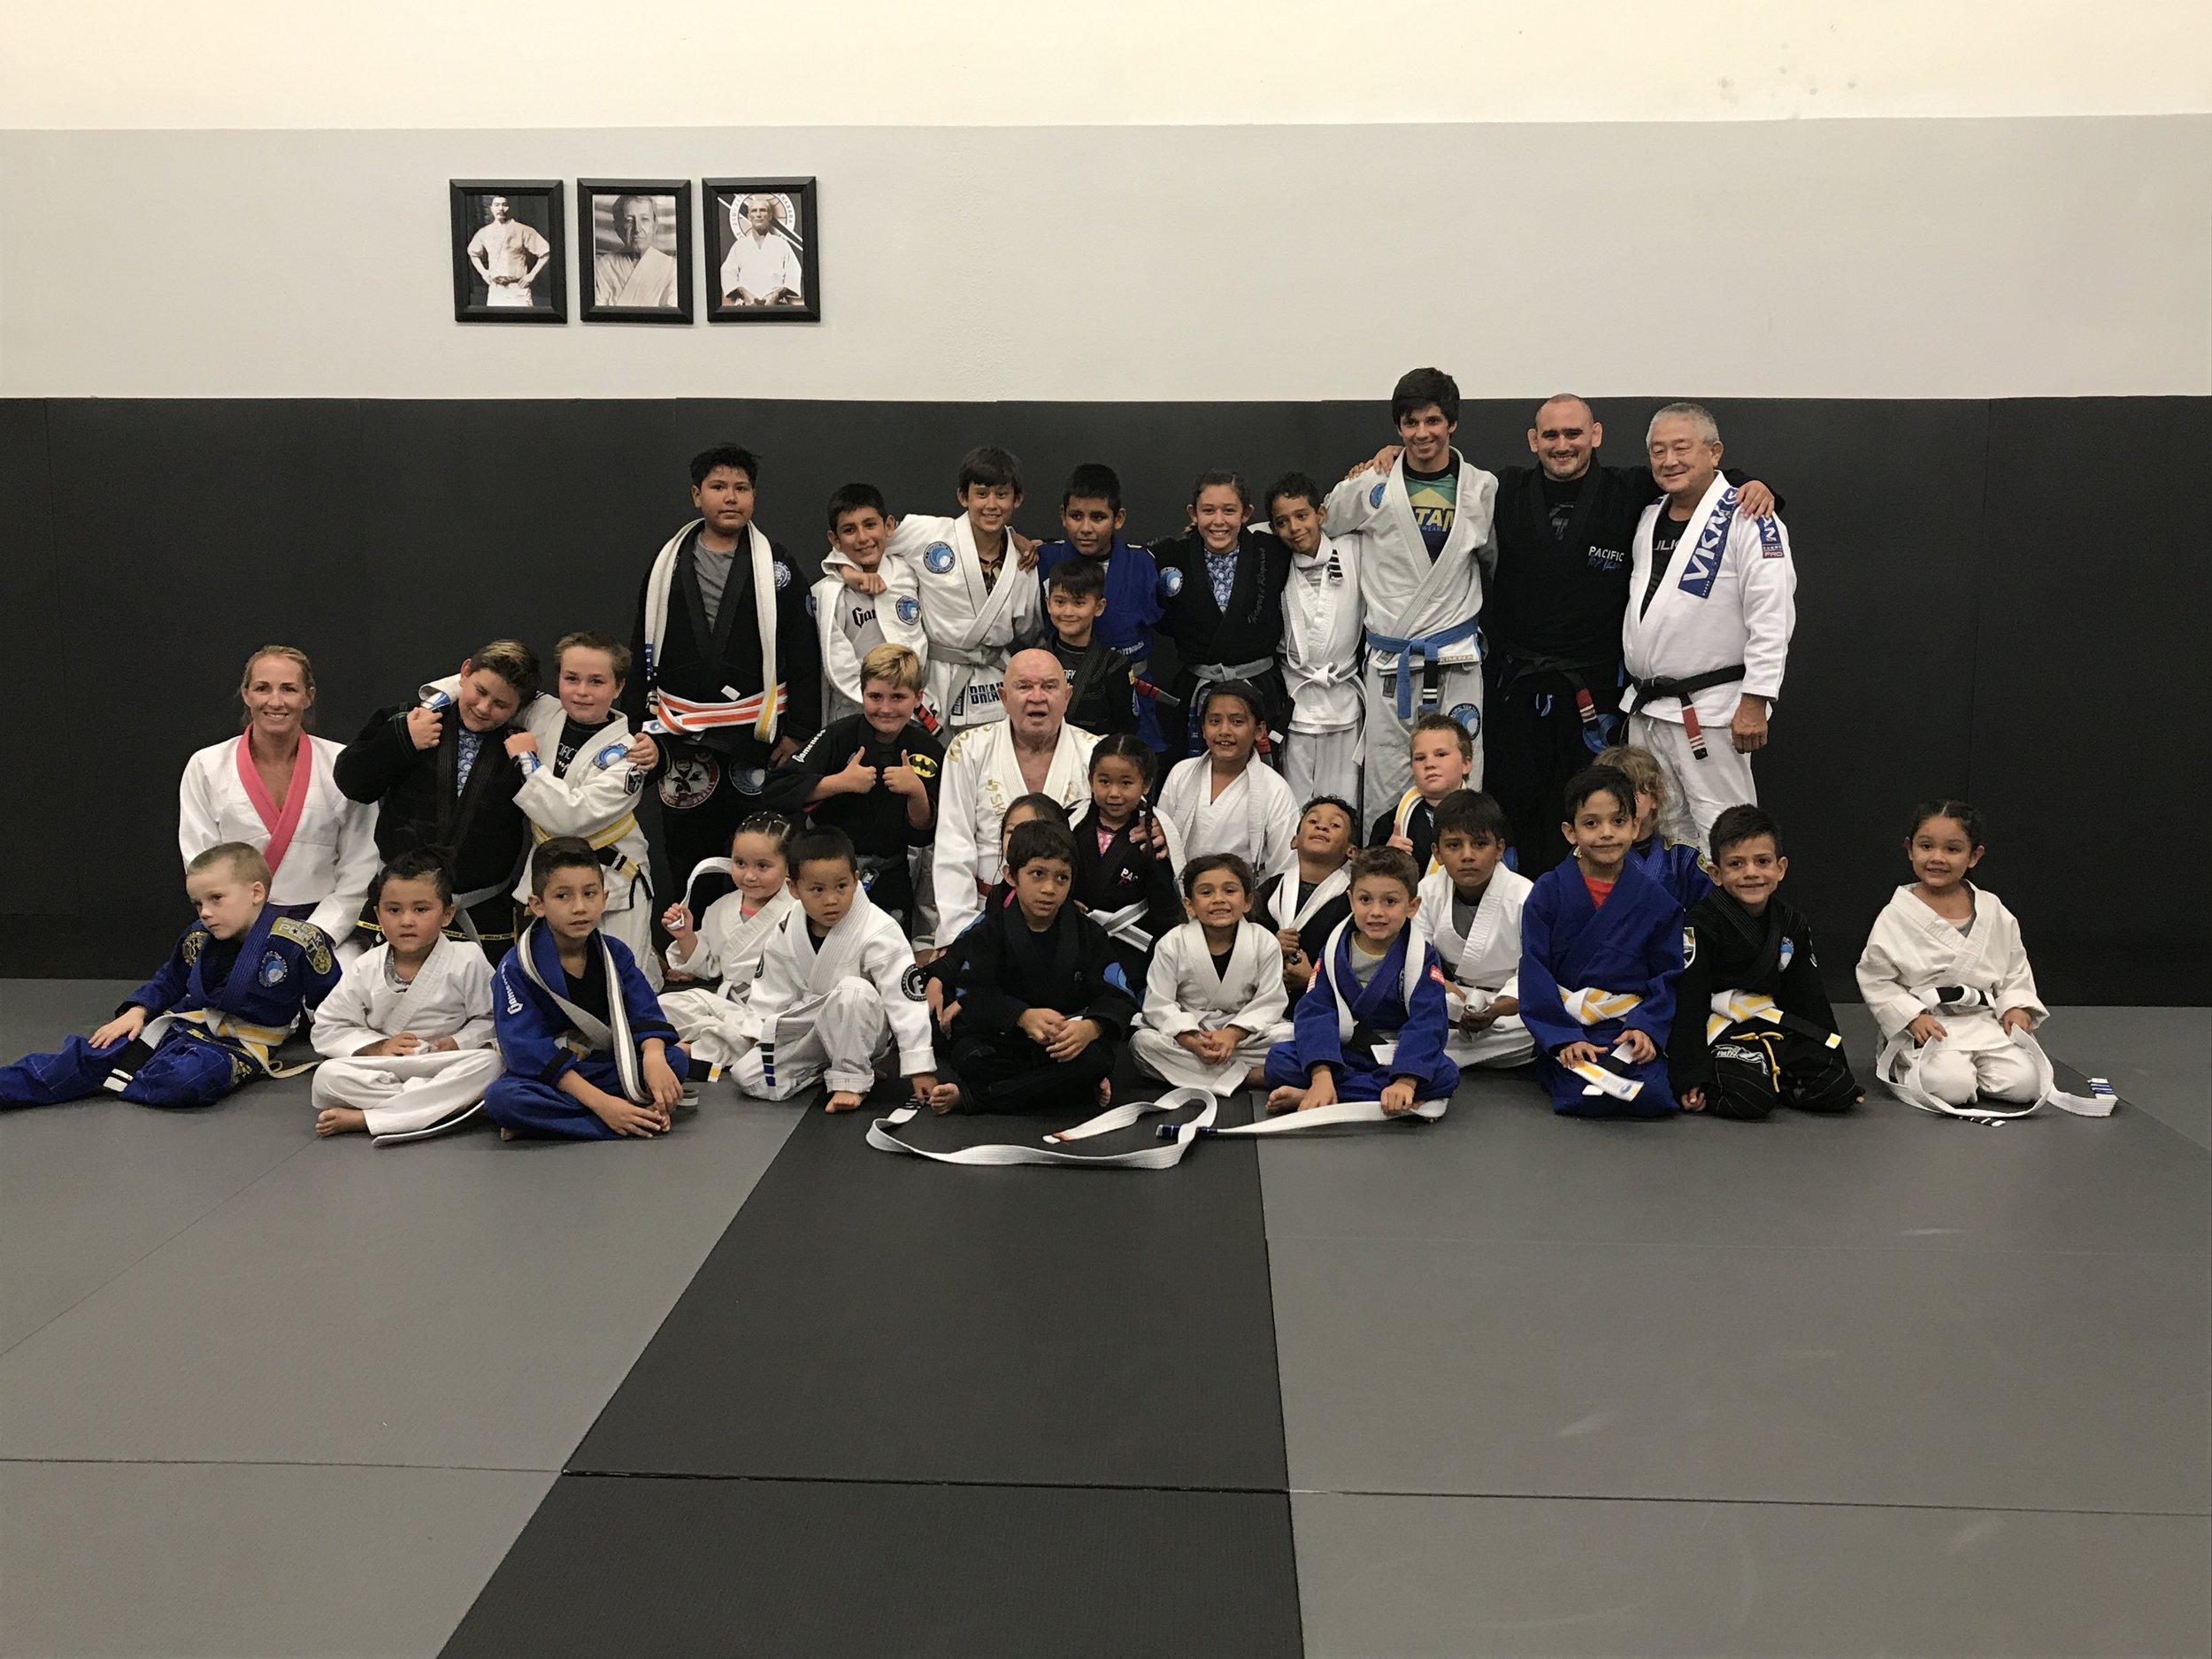 Kids received their Belts from Jiu Jitsu Legend 9th Degree Red Belt GranMaster Francisco Mansor